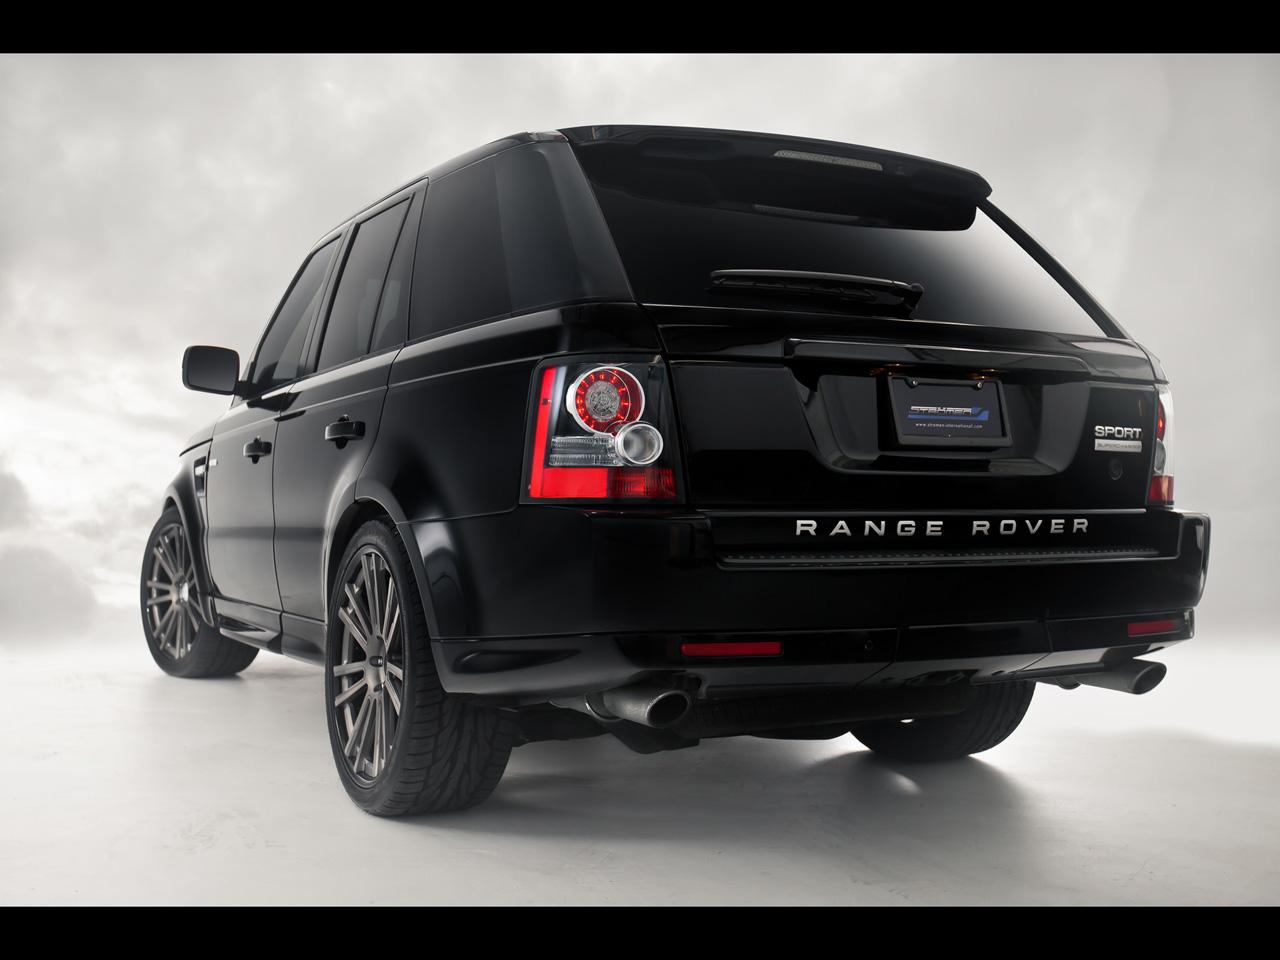 auto latest 2012 stromen range rover sport rrs edition carbon. Black Bedroom Furniture Sets. Home Design Ideas